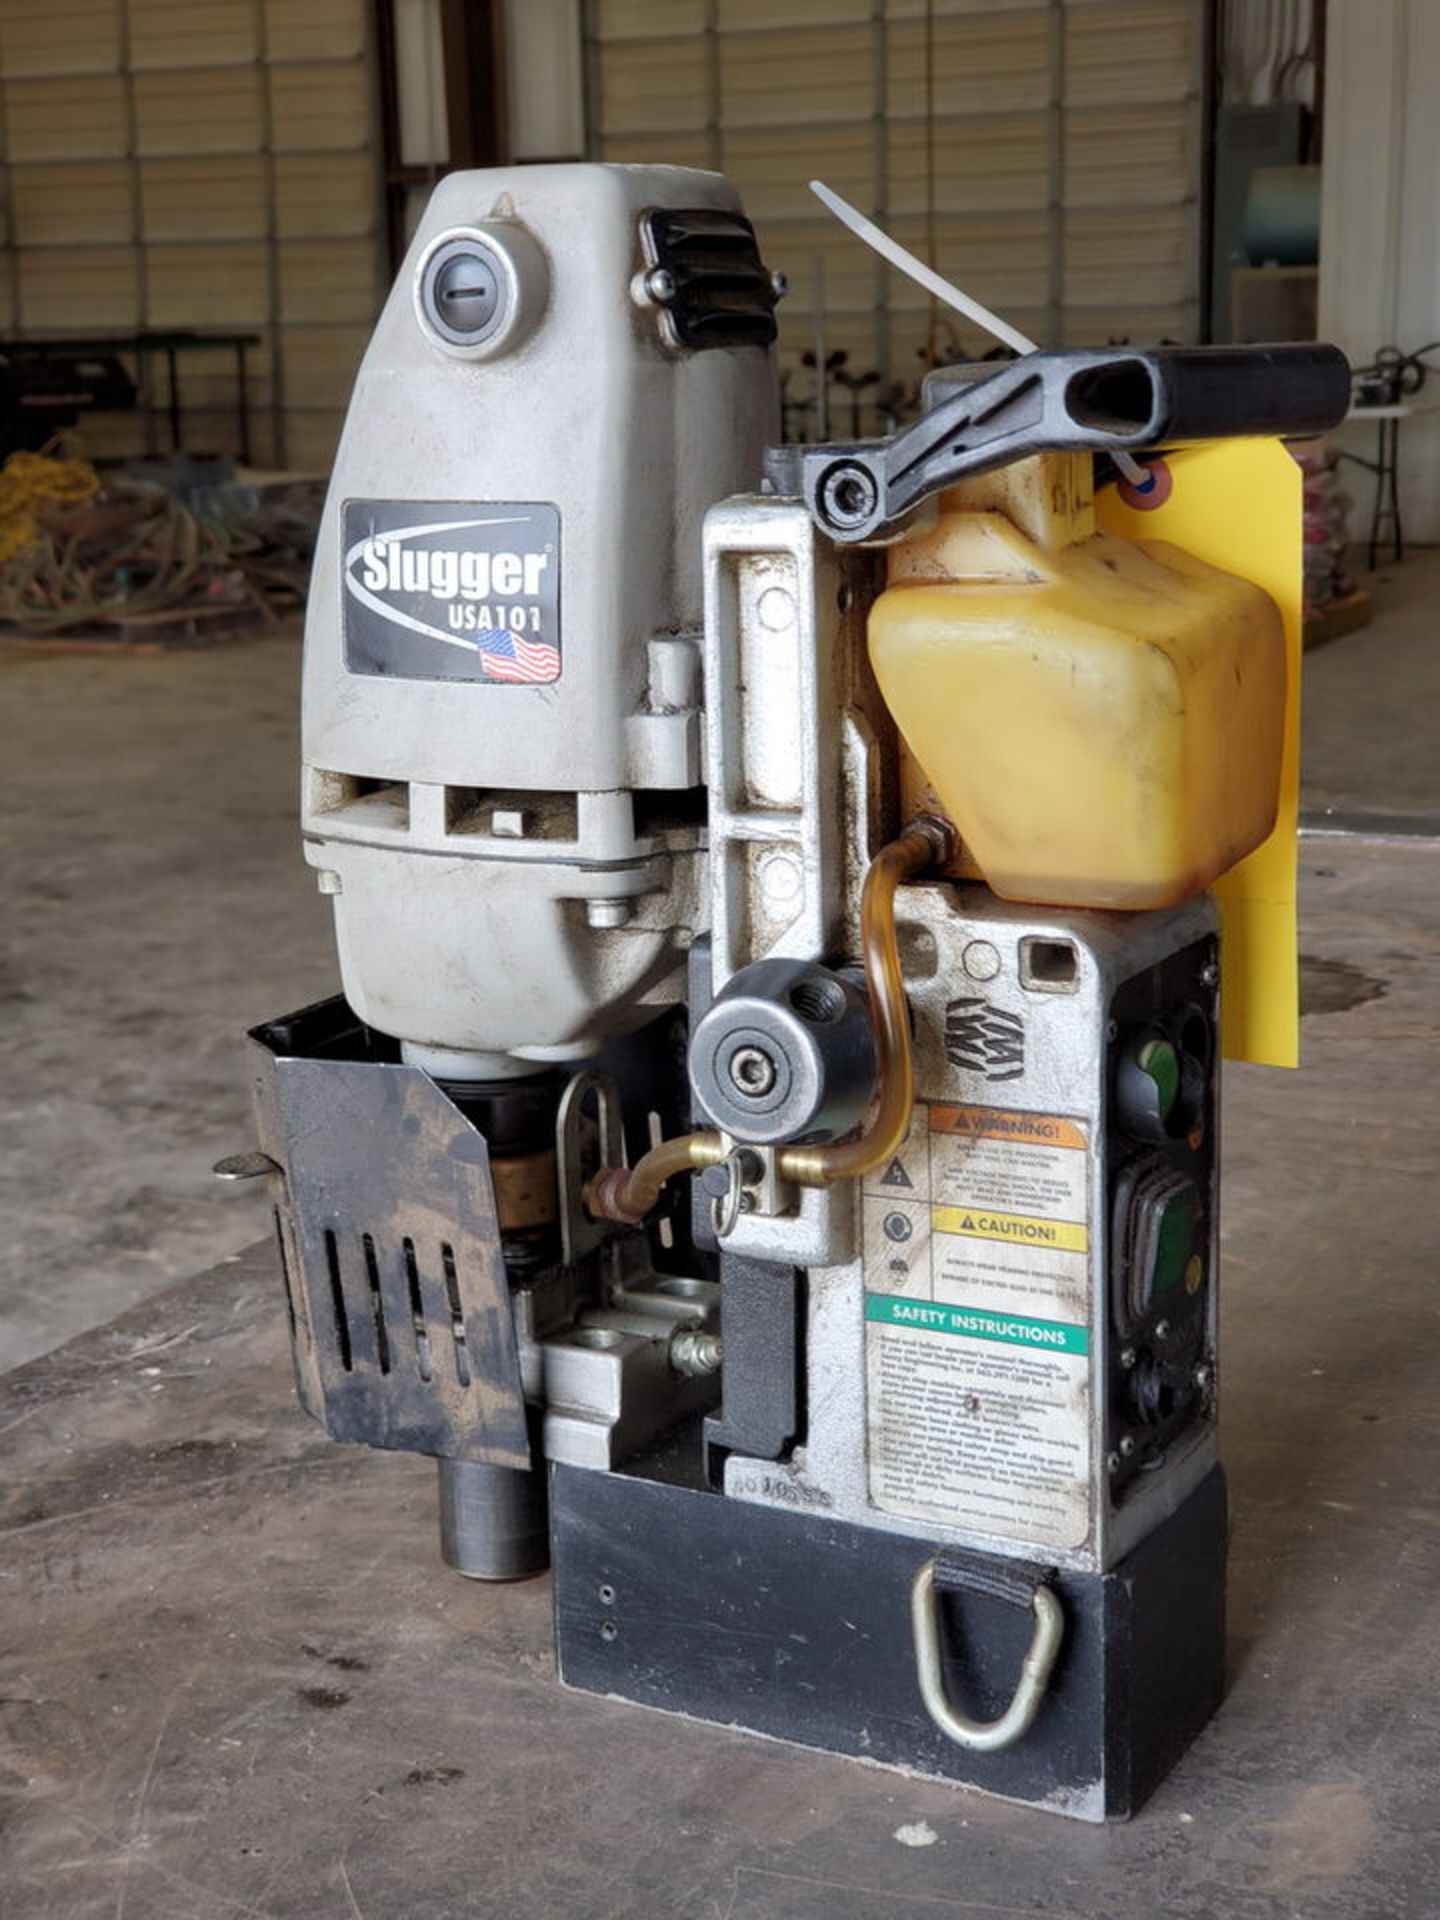 Jancy Slugger USA101 Mag Drill 115V, 11.5A, 50/60HZ, 1400W - Image 2 of 5